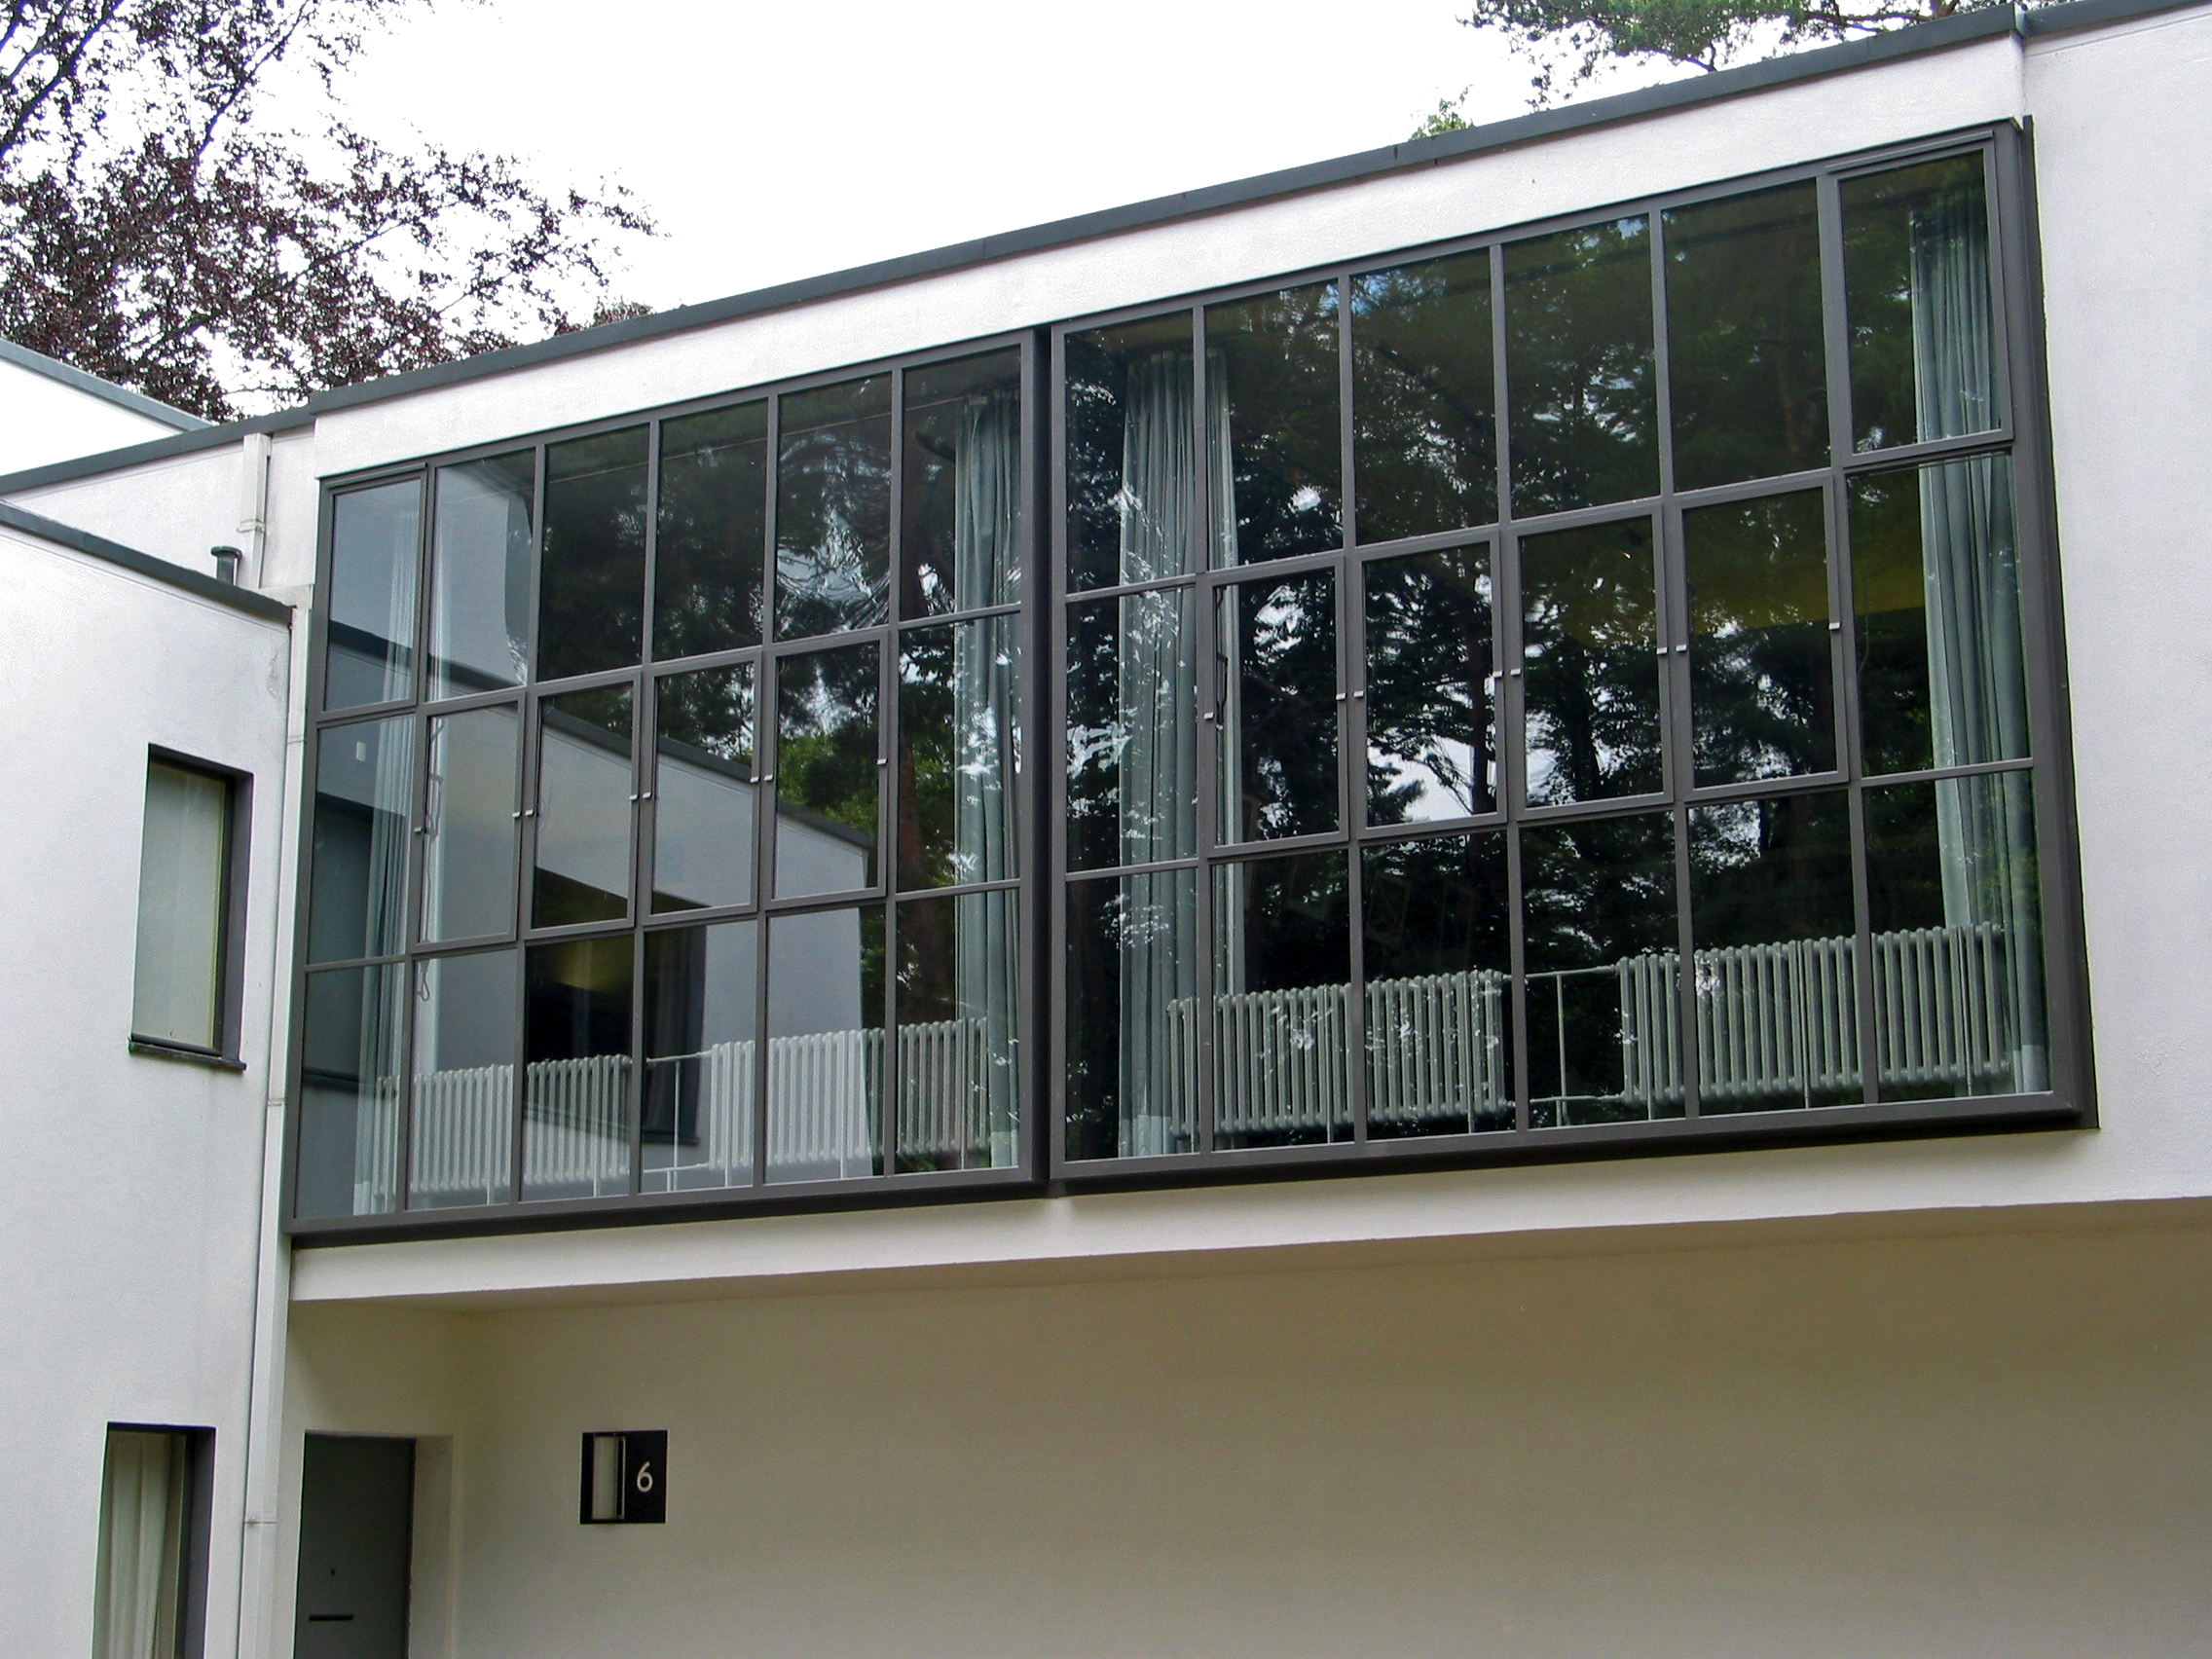 file meisterh user nr 6 7 haus kandinsky klee. Black Bedroom Furniture Sets. Home Design Ideas